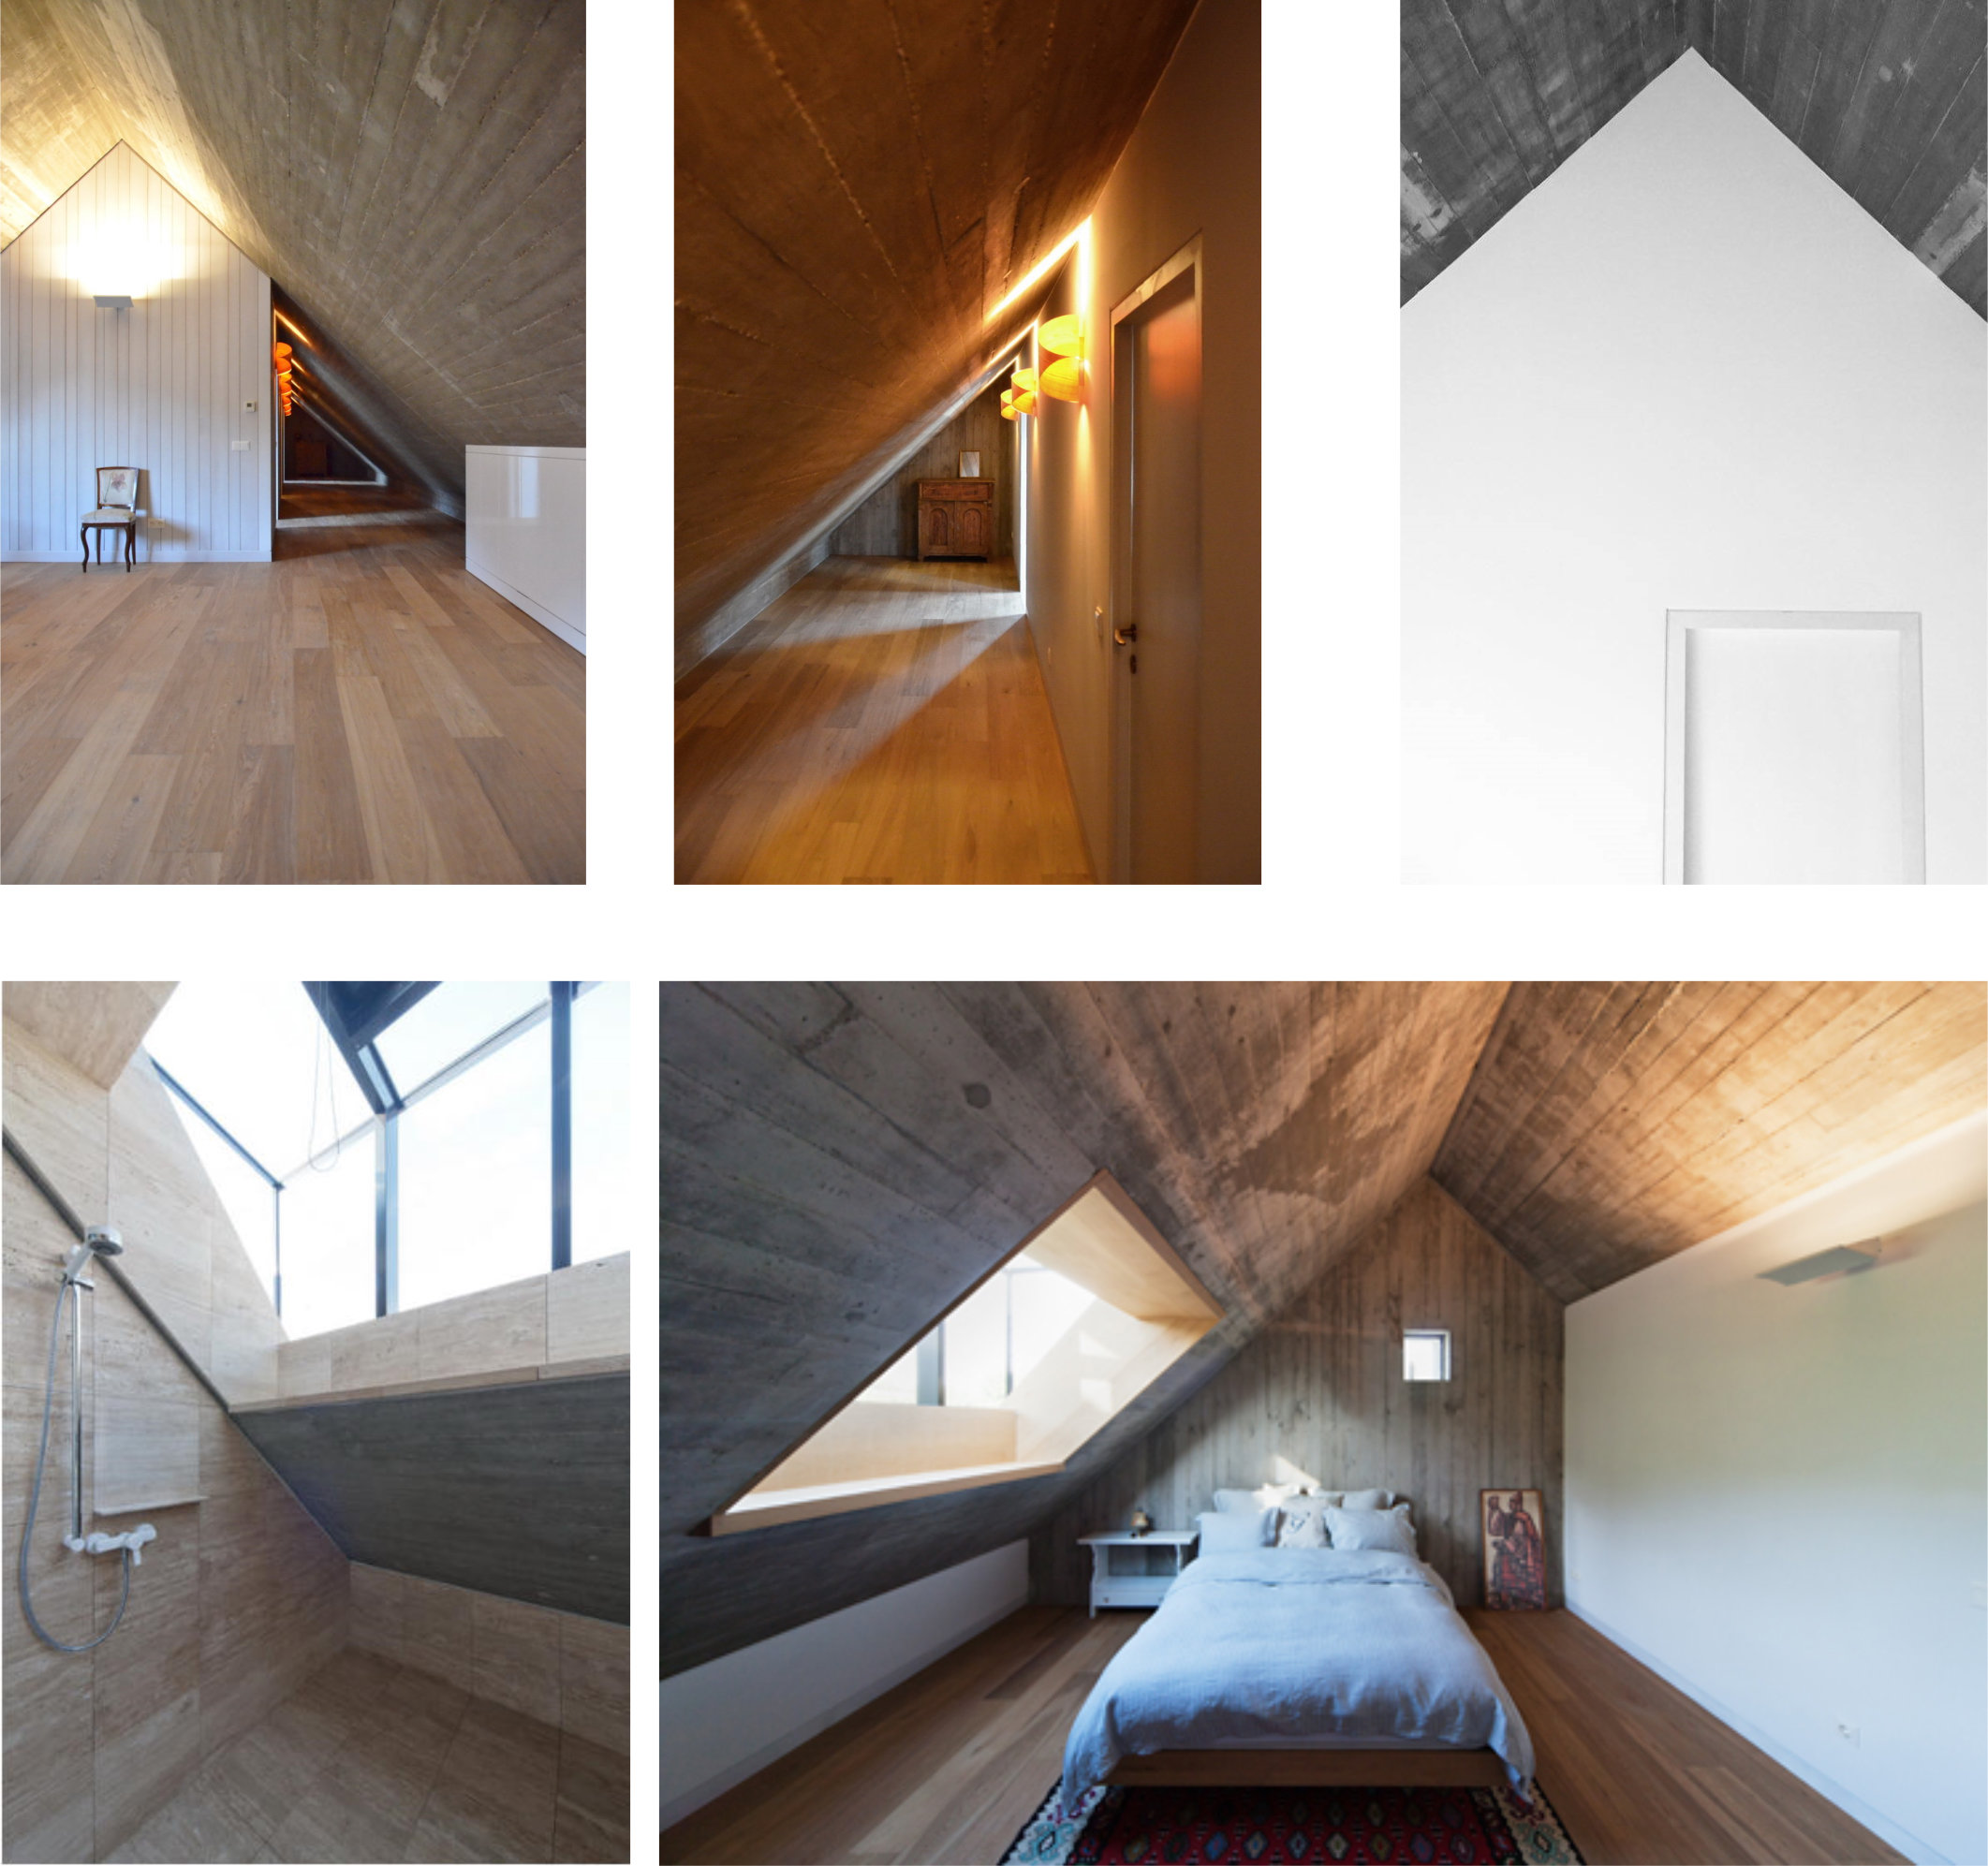 interiorlines_balatoni_gyongyszem4.jpg